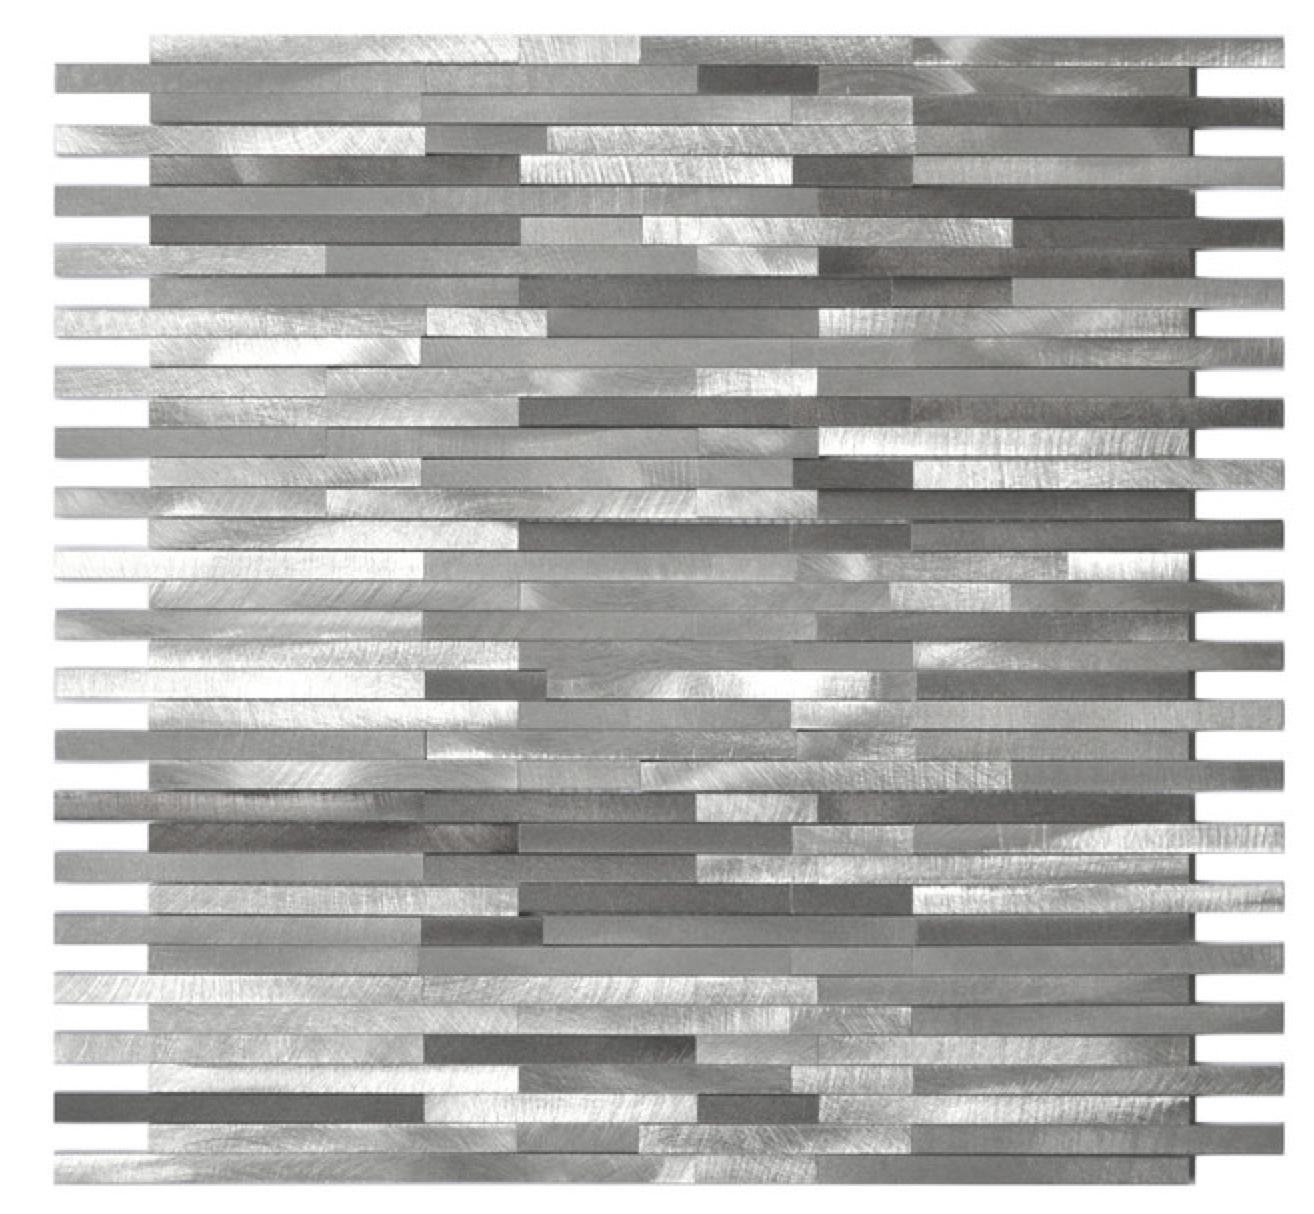 Bathroom Tile So Nice Http Www Houzz Com Photos 4742398 Gray Blends Aluminum Mosaic Tile Contemporary Mosaic T Metal Mosaic Tiles Mosaic Tiles Tile Trends